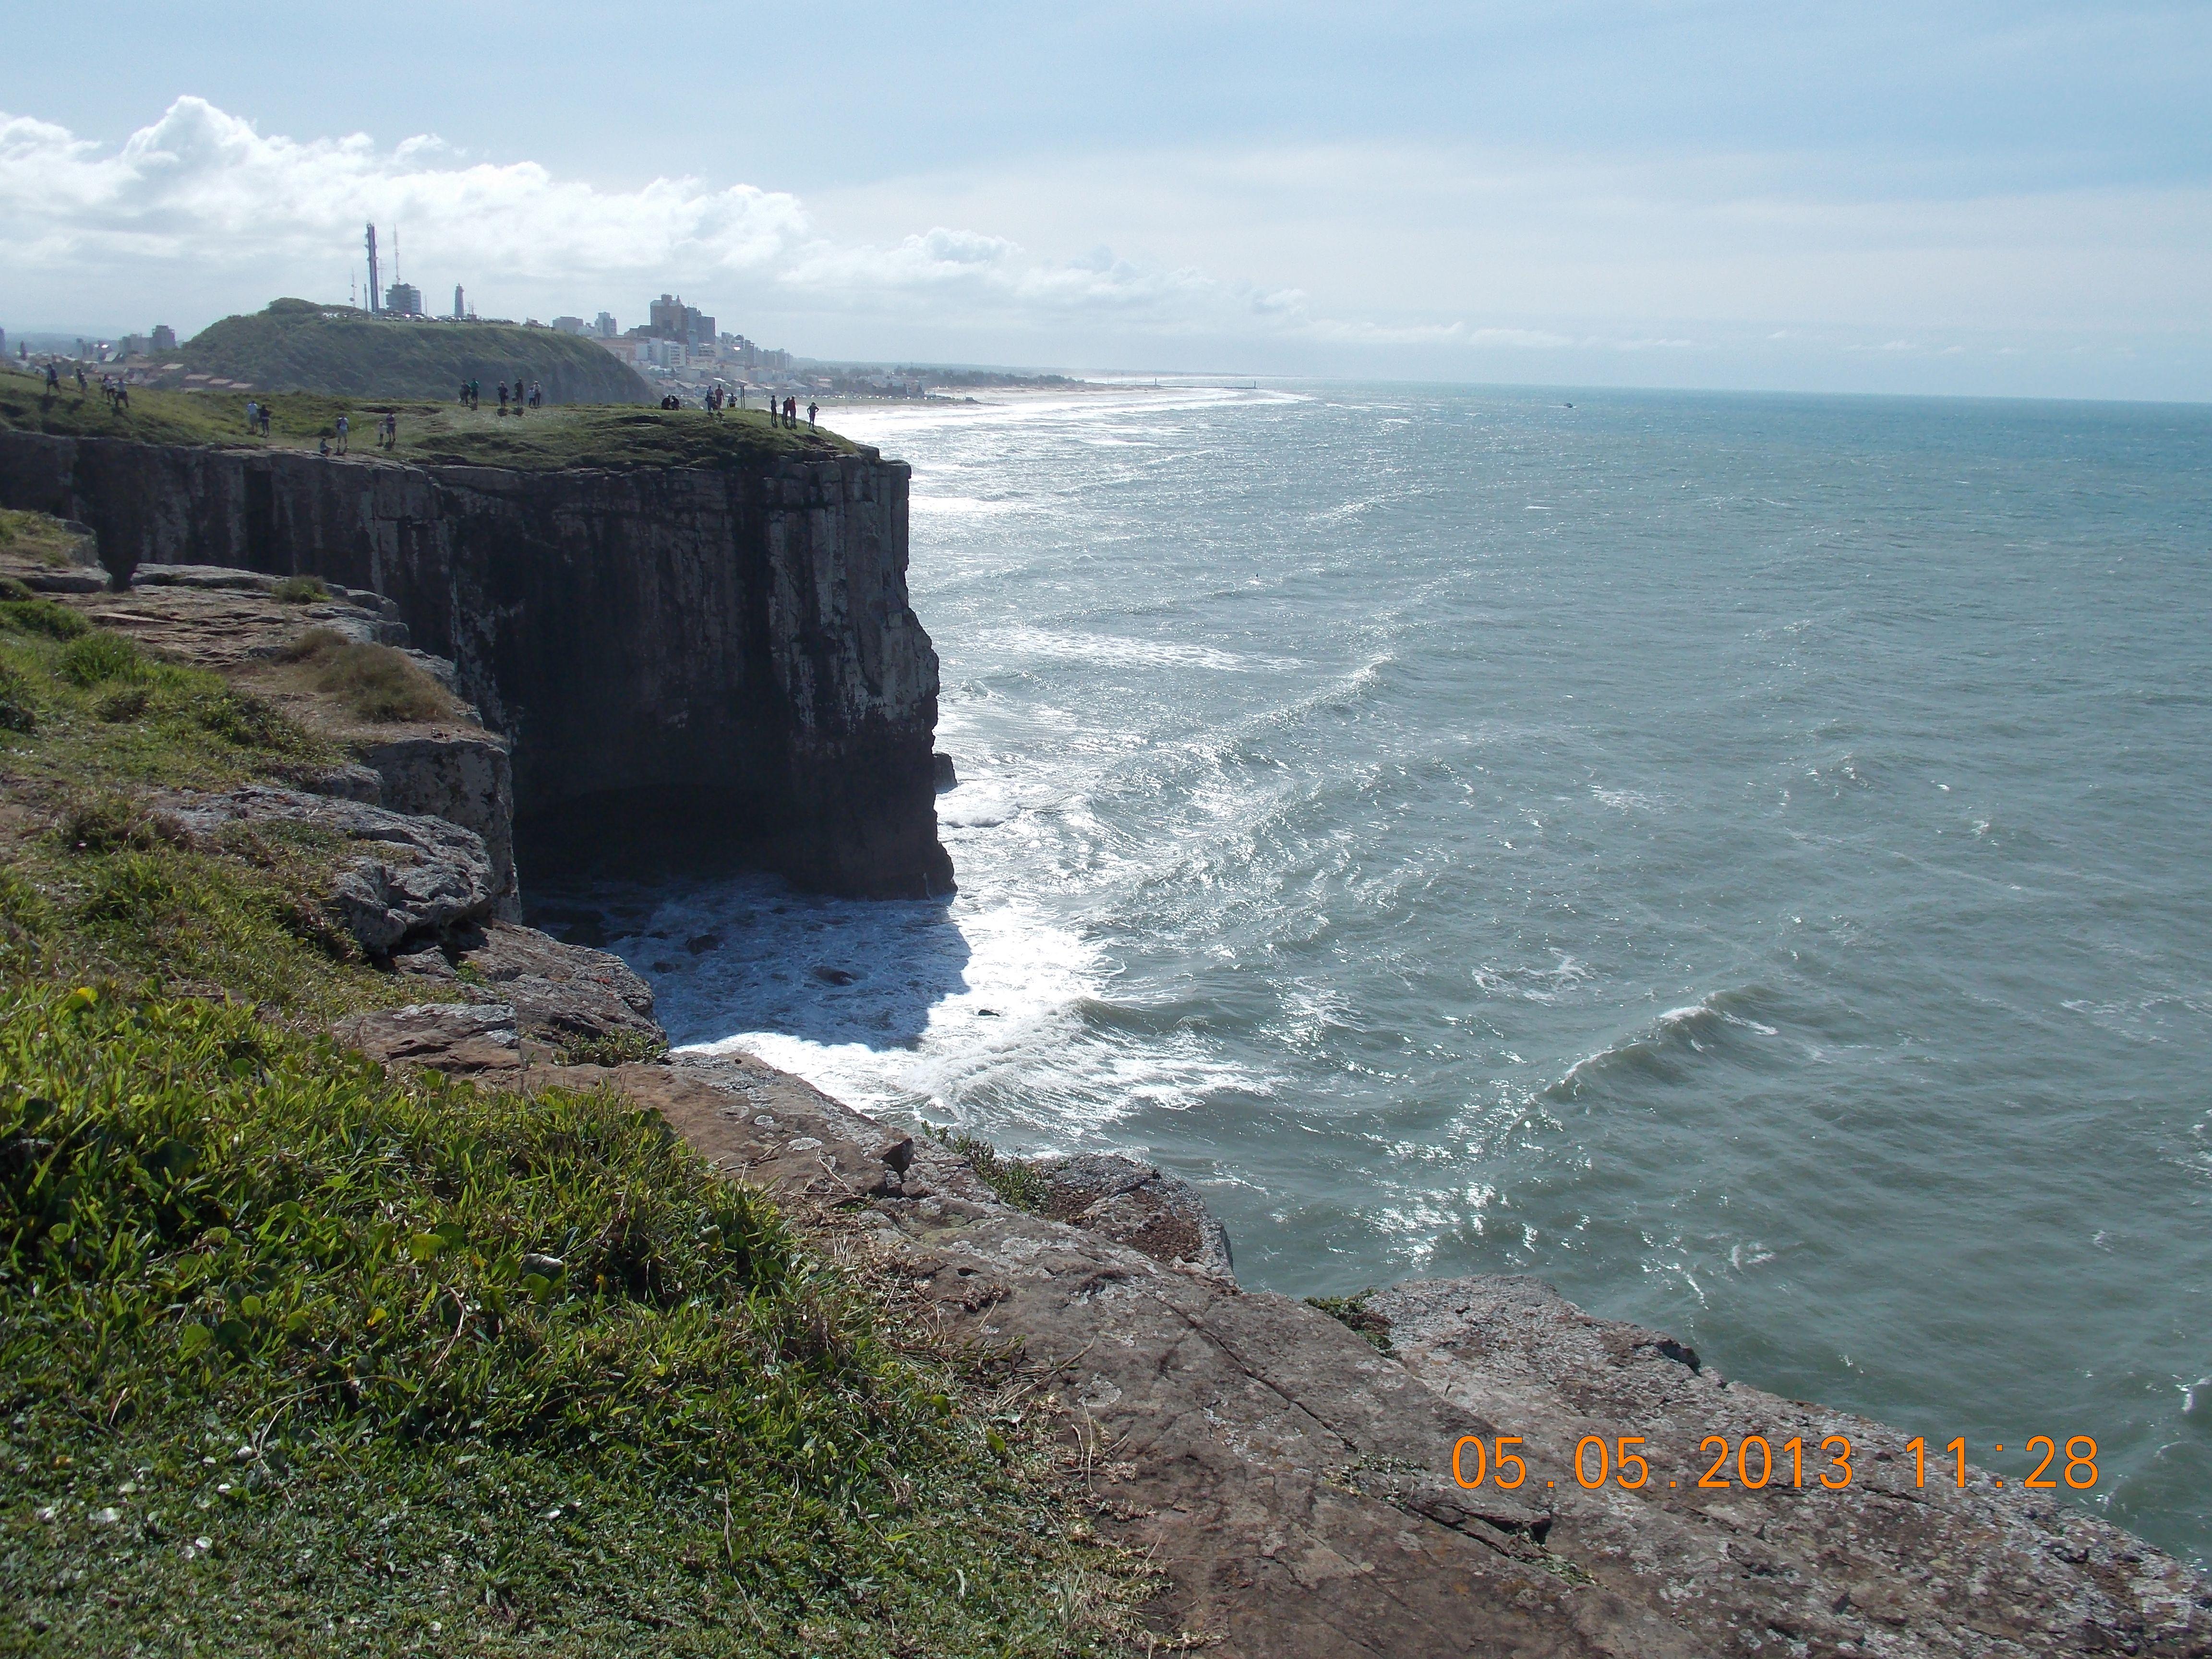 Tudo sobre o município de Torres - Estado do Rio Grande do